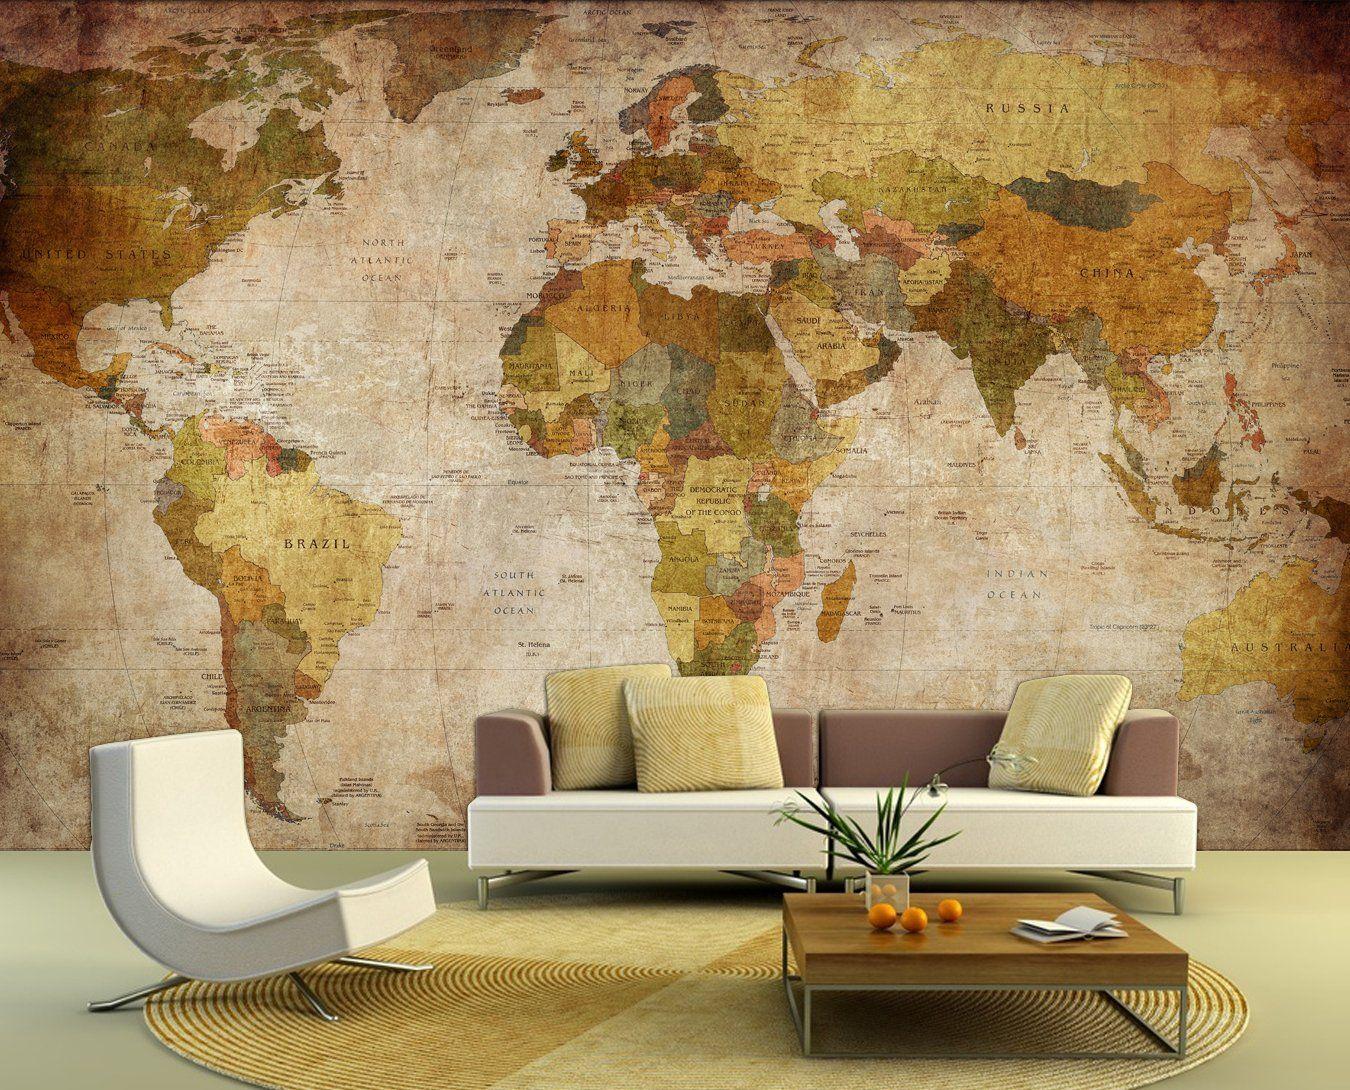 bilderdepot24 self adhesive photo wallpaper wall mural world map retro style